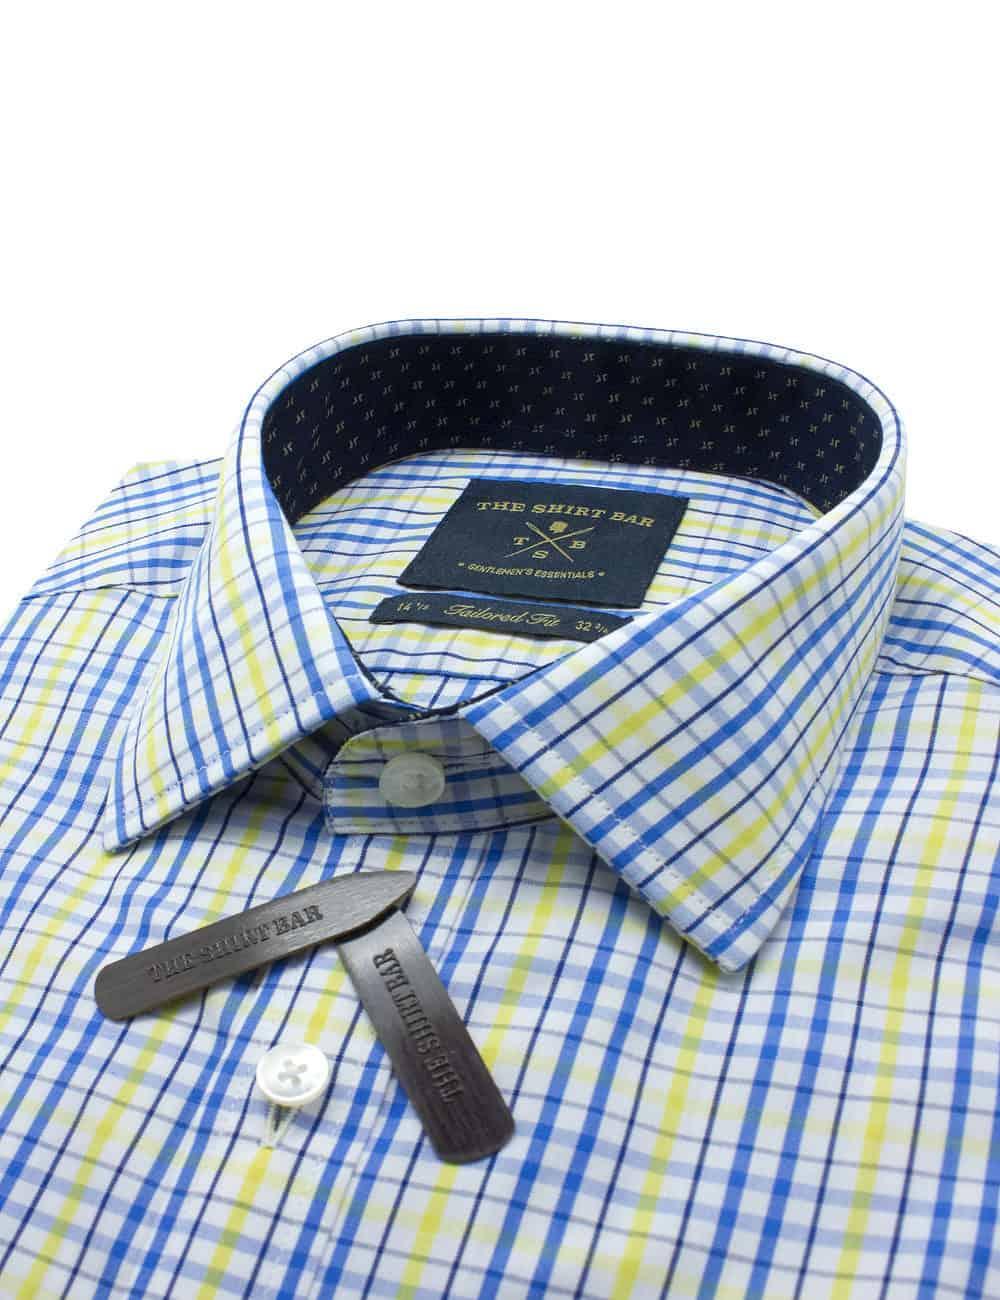 TF Blue and Yellow Checks Eco-ol Bamboo Shirt TF2A6.7